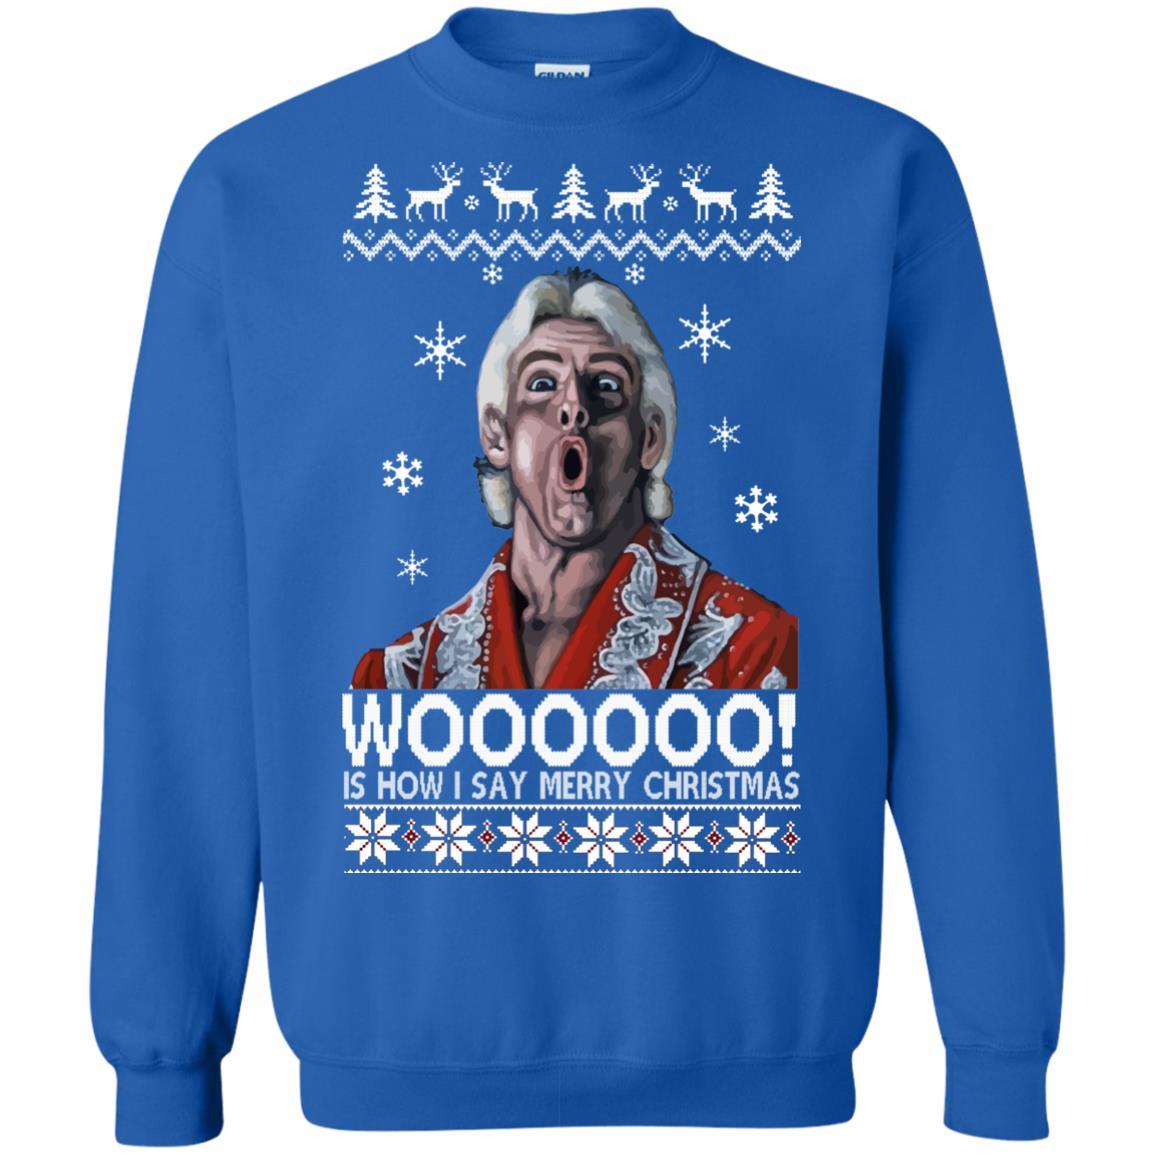 image 1645 - Green Ric Flair WOO Christmas Sweater, Ugly Sweatshirt